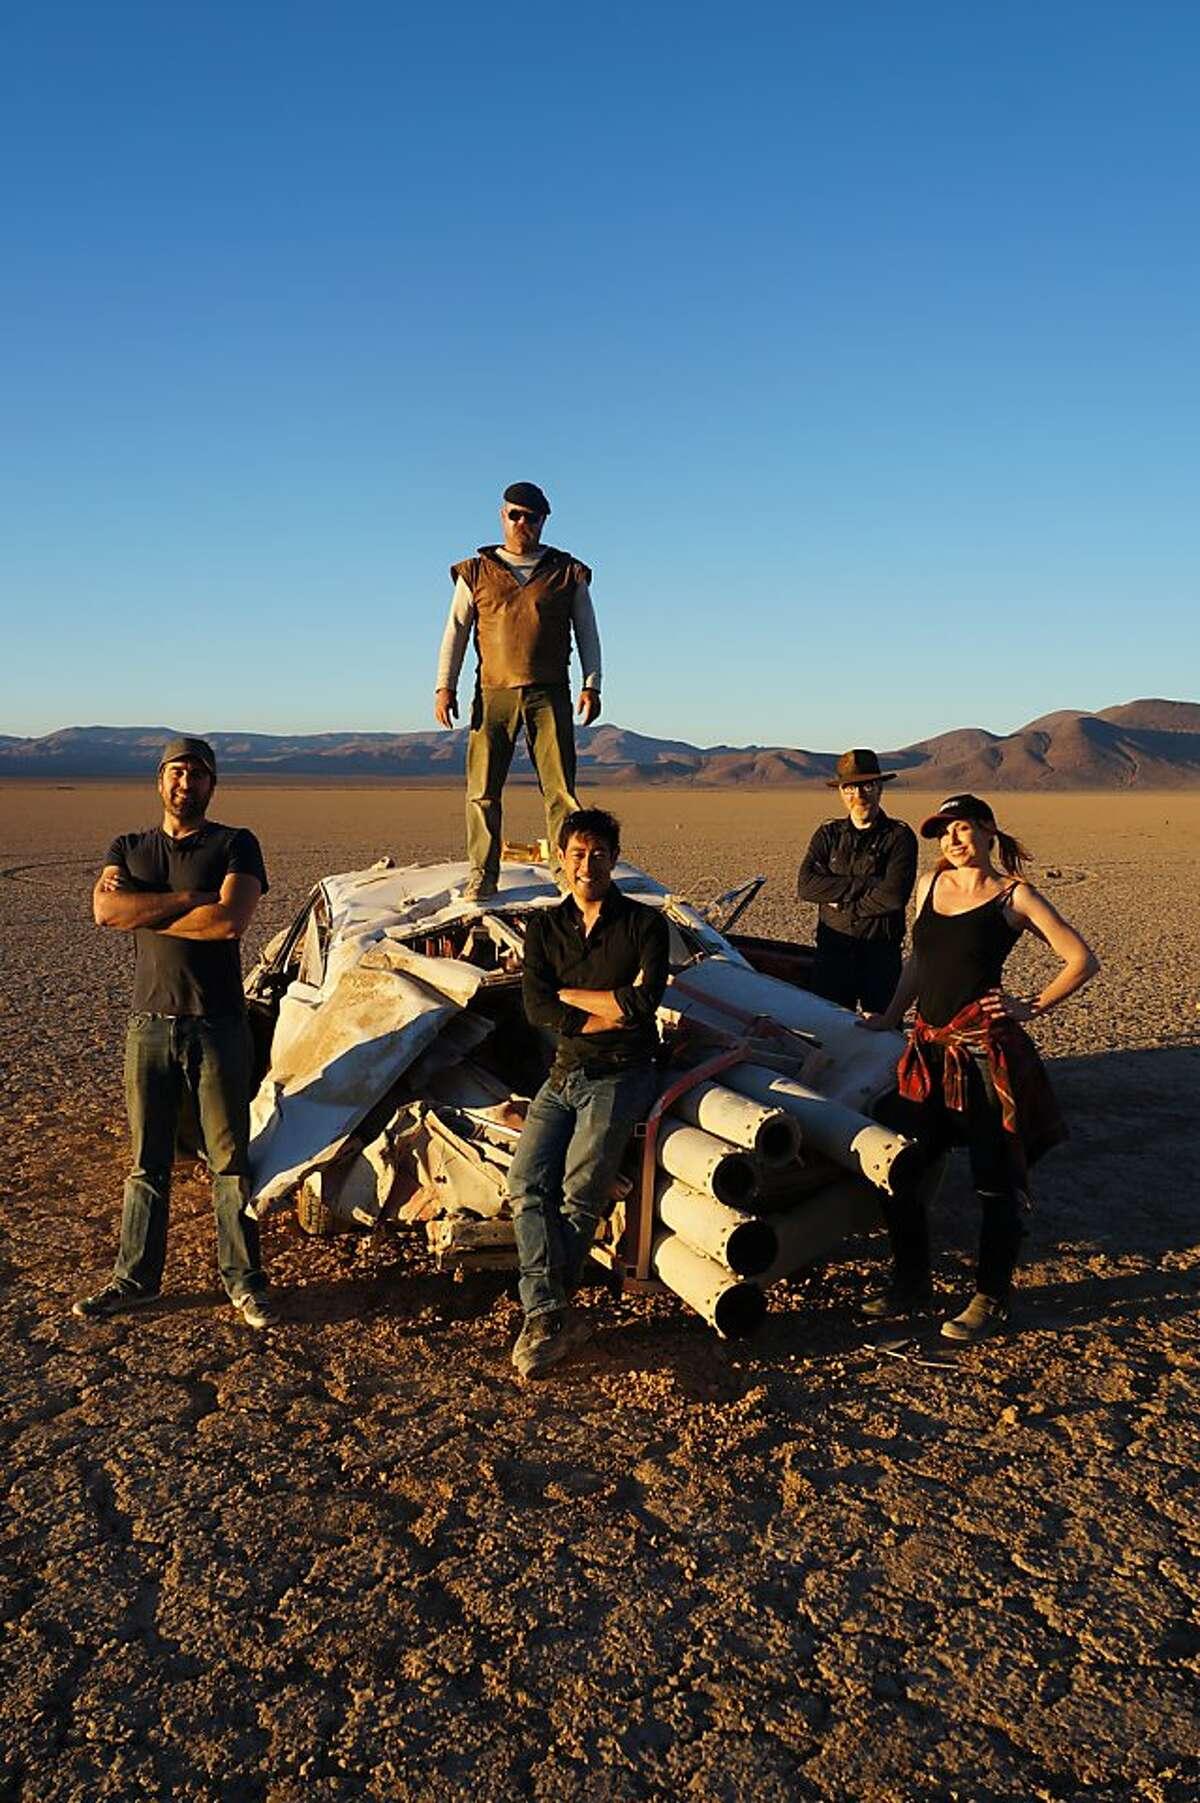 Jamie Hyneman, Adam Savage, Tory Belleci, Grant Imahara and Kari Byron pose on the crashed JATO Rocket Car after testing.